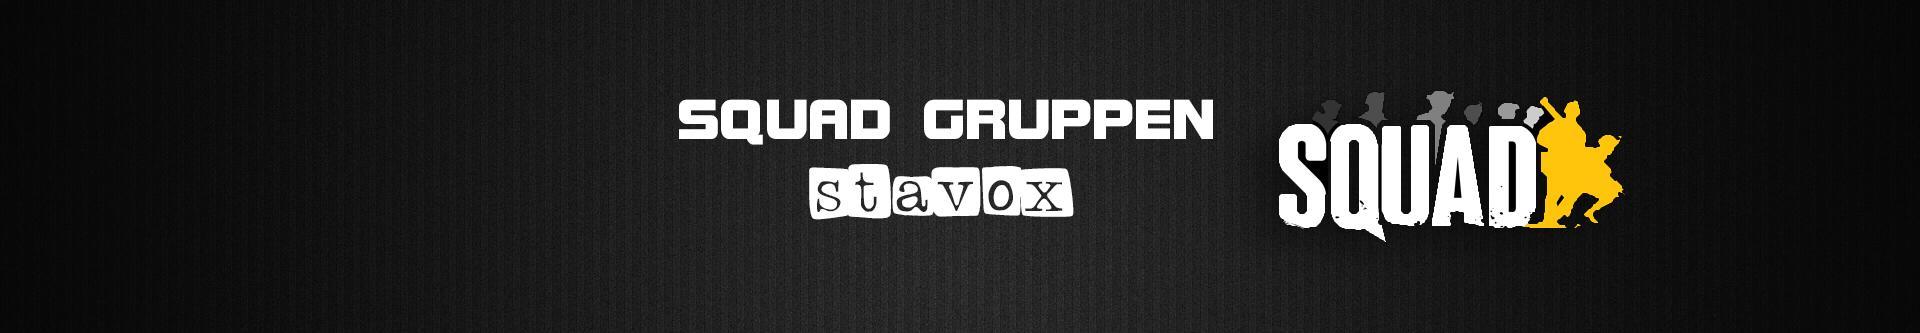 Squad Gruppen